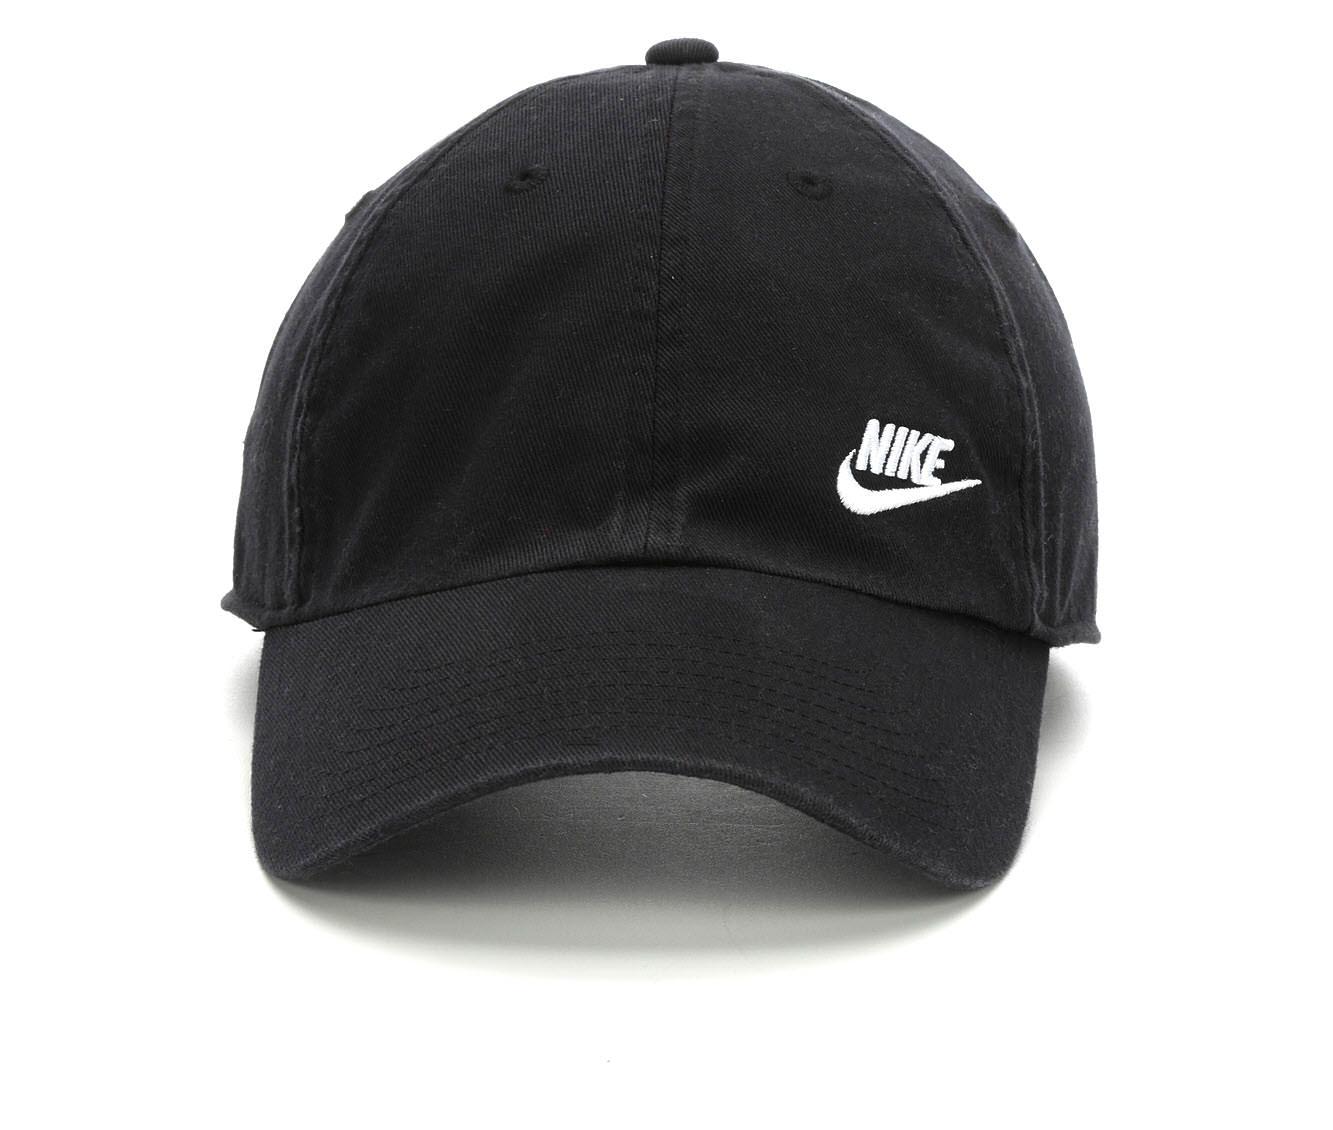 Nike Futura Classic Hat (Black - Size UNSZ) 1721610